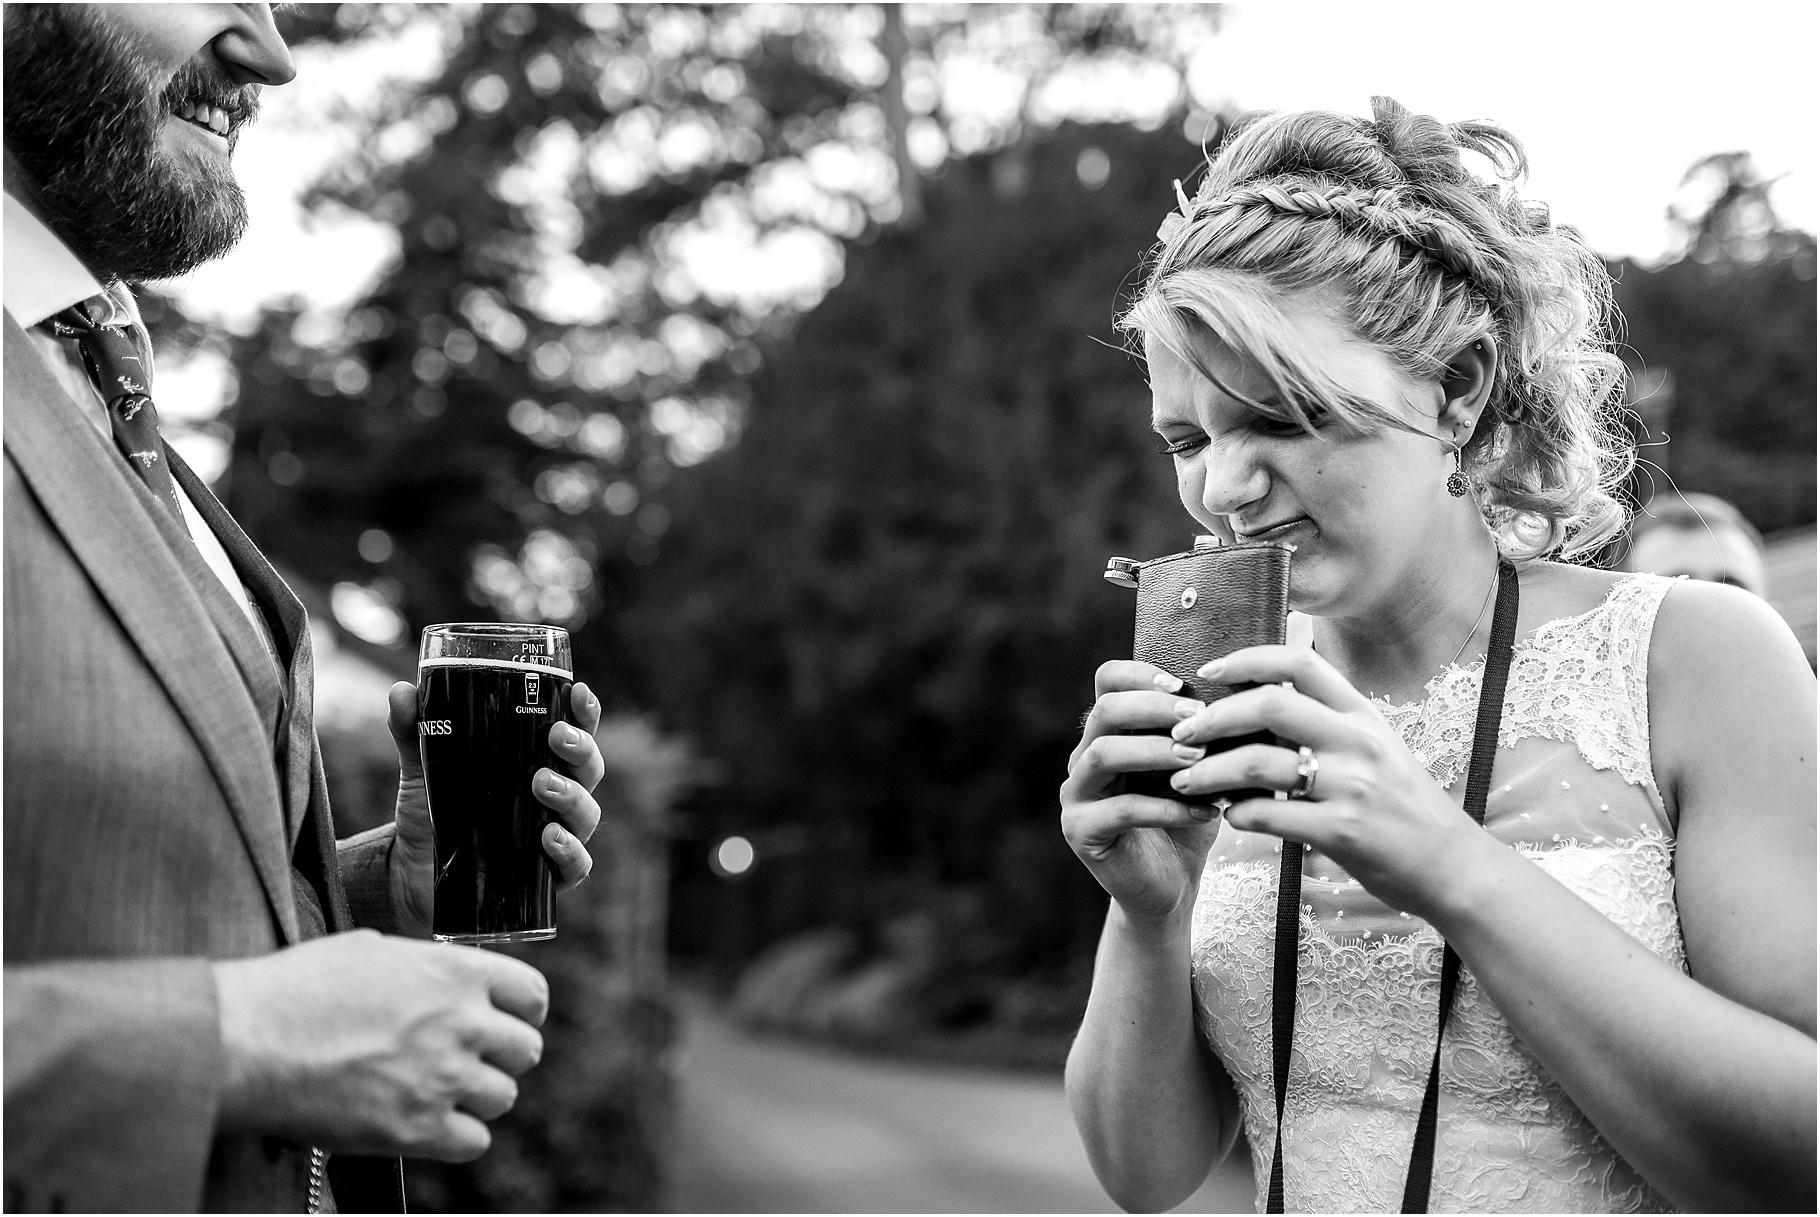 dan-wootton-photography-2017-weddings-057.jpg